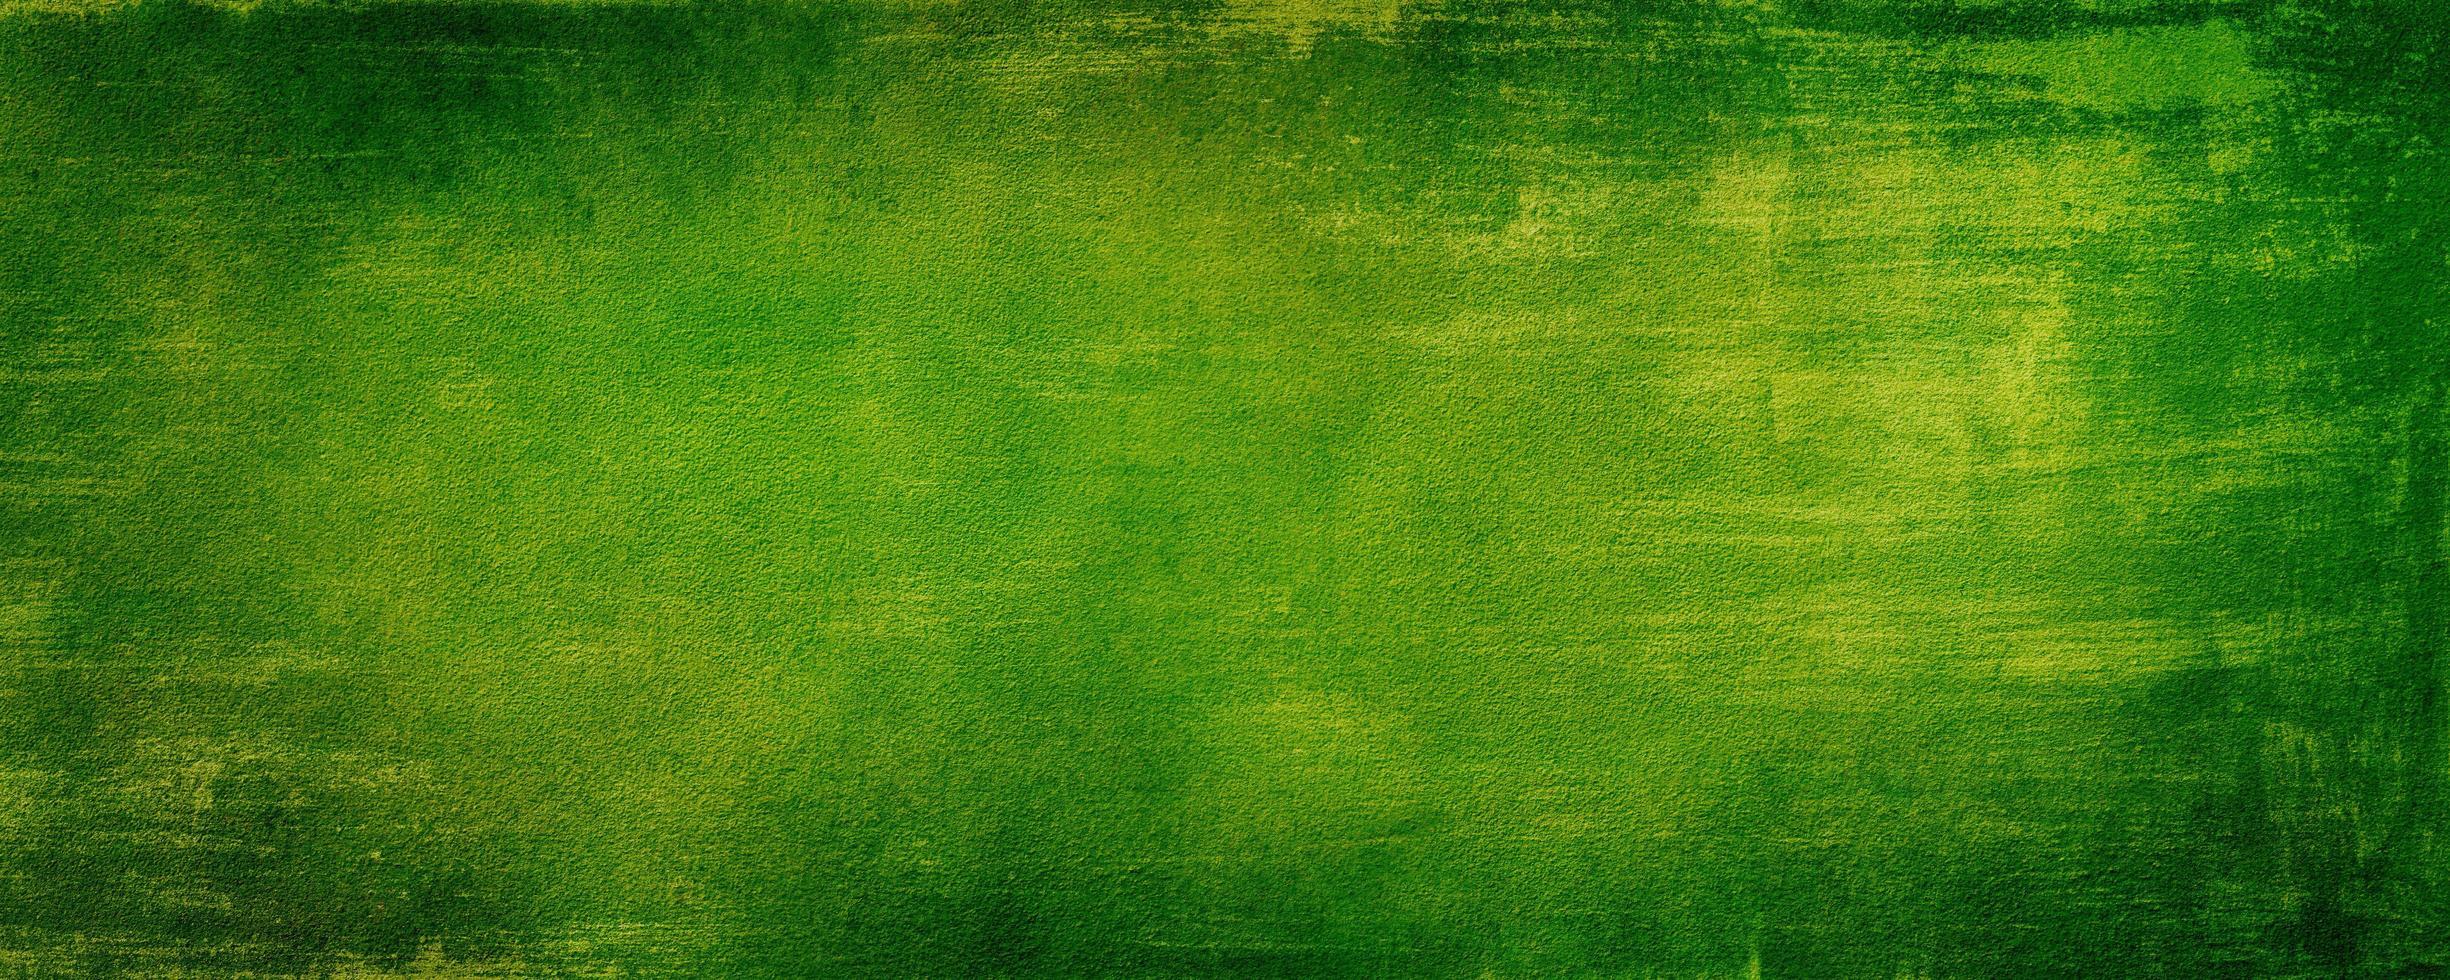 abstracte groene cement muur achtergrond met gekrast, pastelkleur, moderne achtergrond beton met ruwe textuur, schoolbord. concrete kunst ruwe gestileerde textuur foto